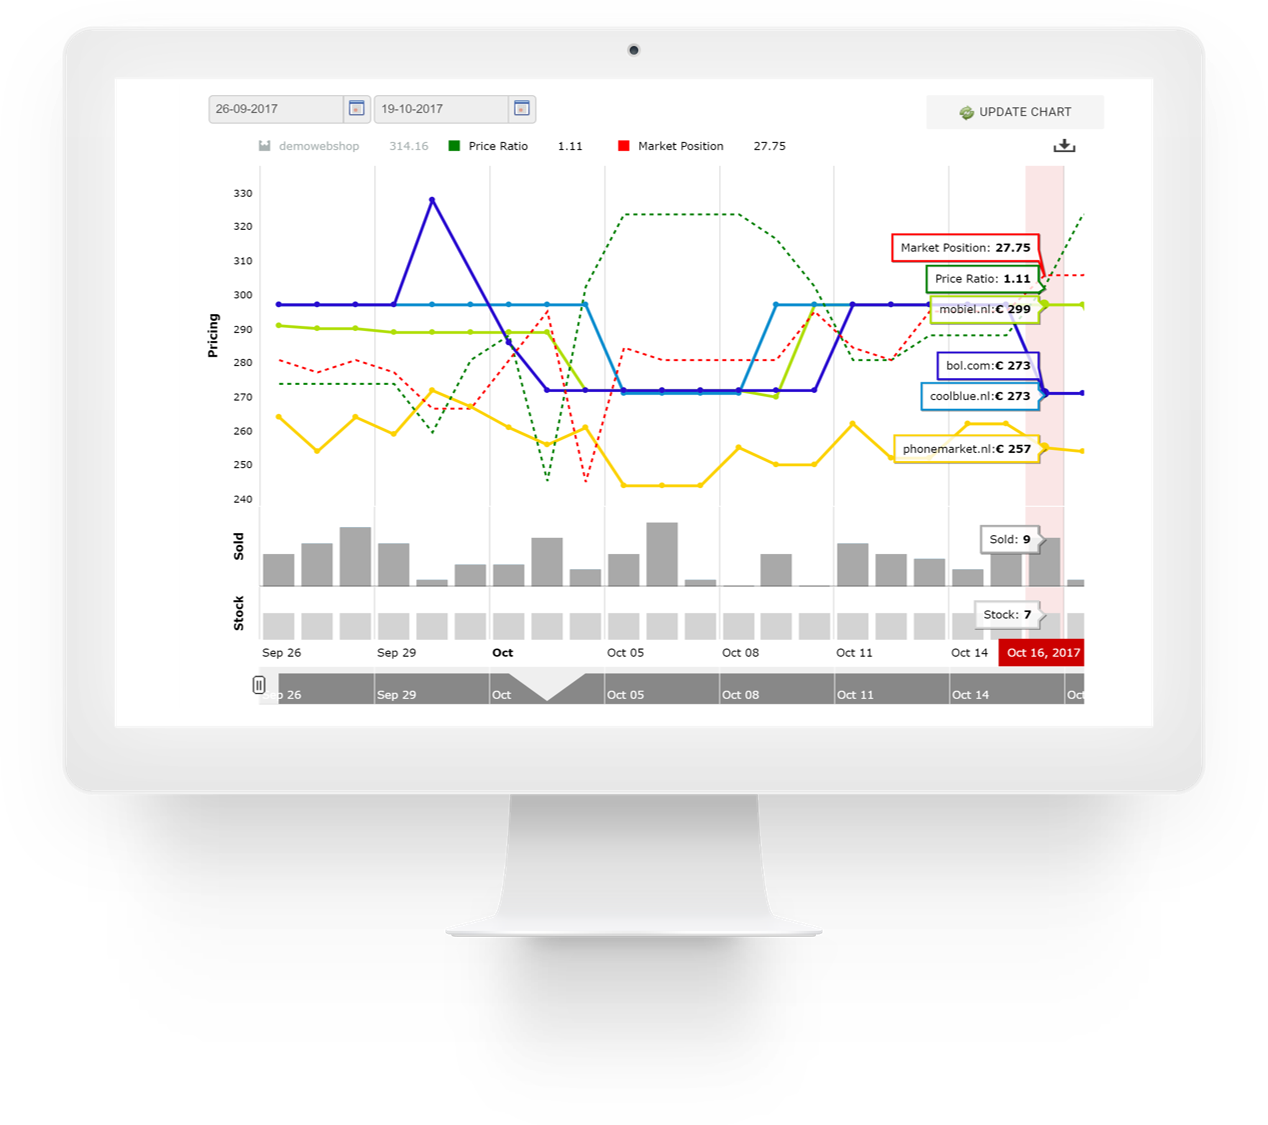 Omnia Pricewatch - Pricing data